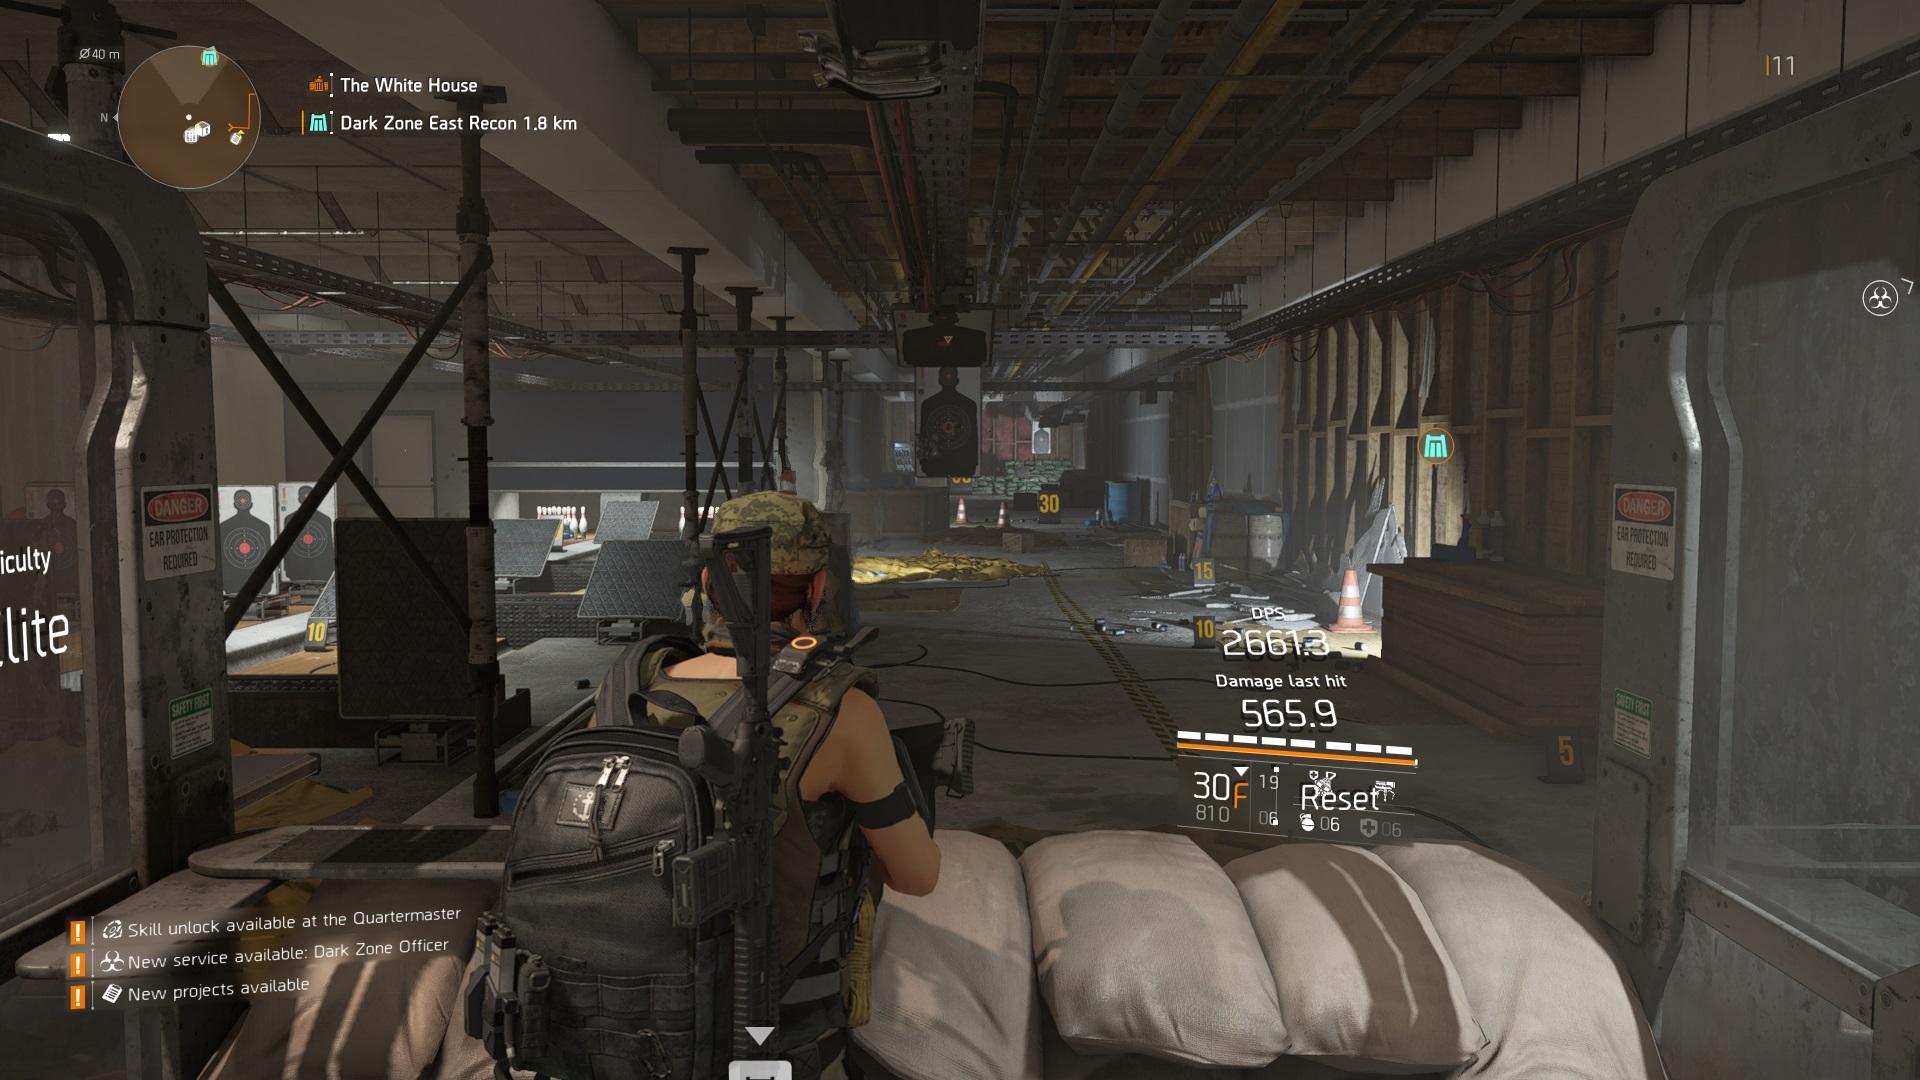 The Division 2 Gun Range DPS